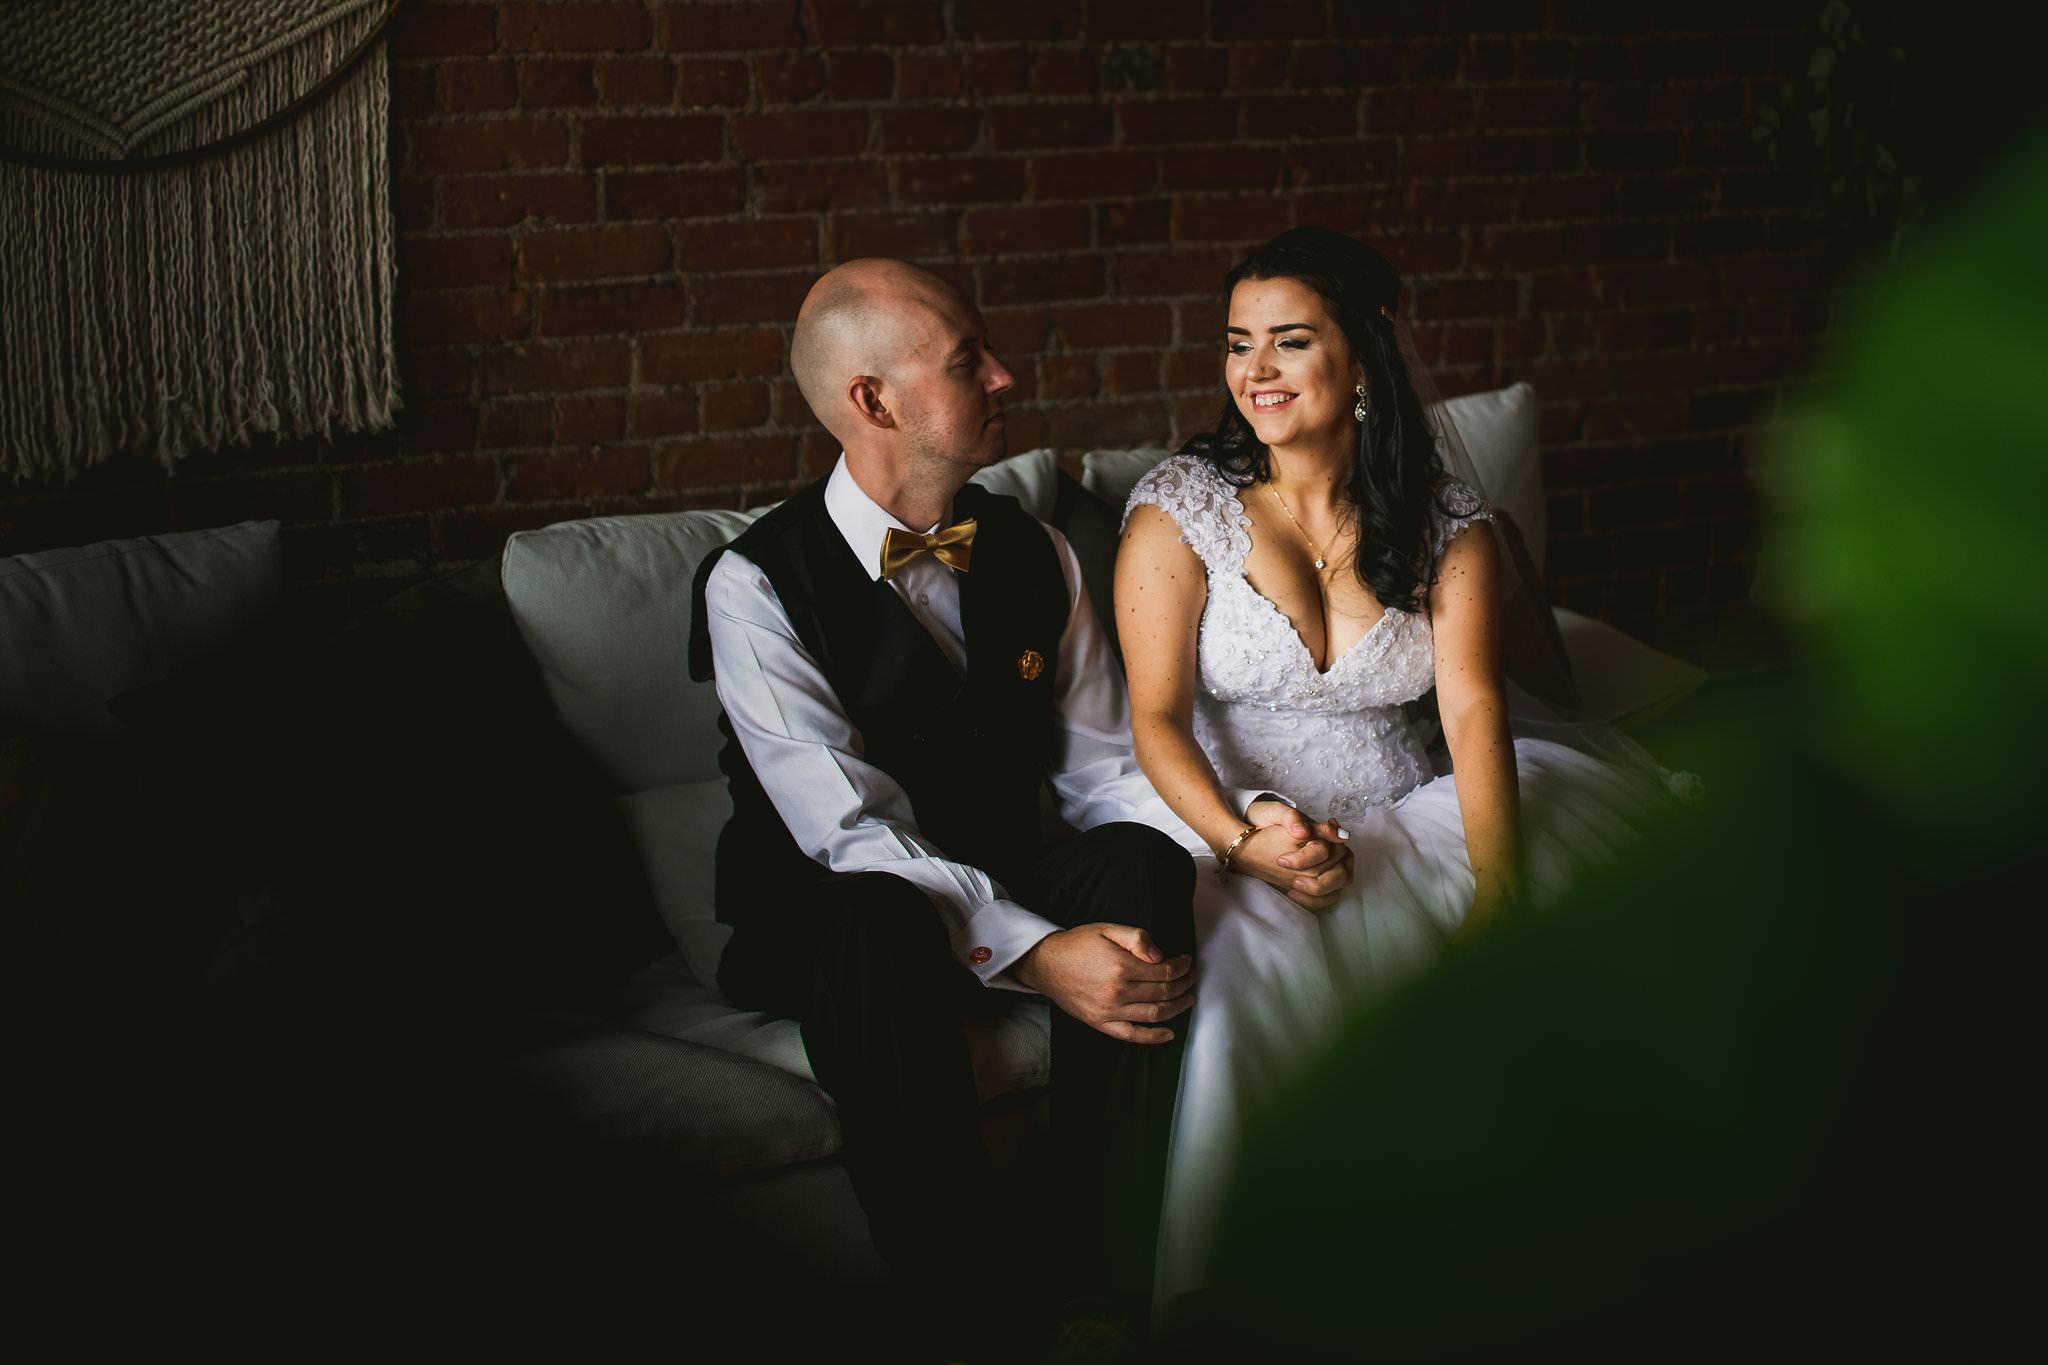 Kristen Adam Kindred Loft Whitby Wedding Photos 311 - Durham Wedding Photographer: Kindred Loft Wedding Photos